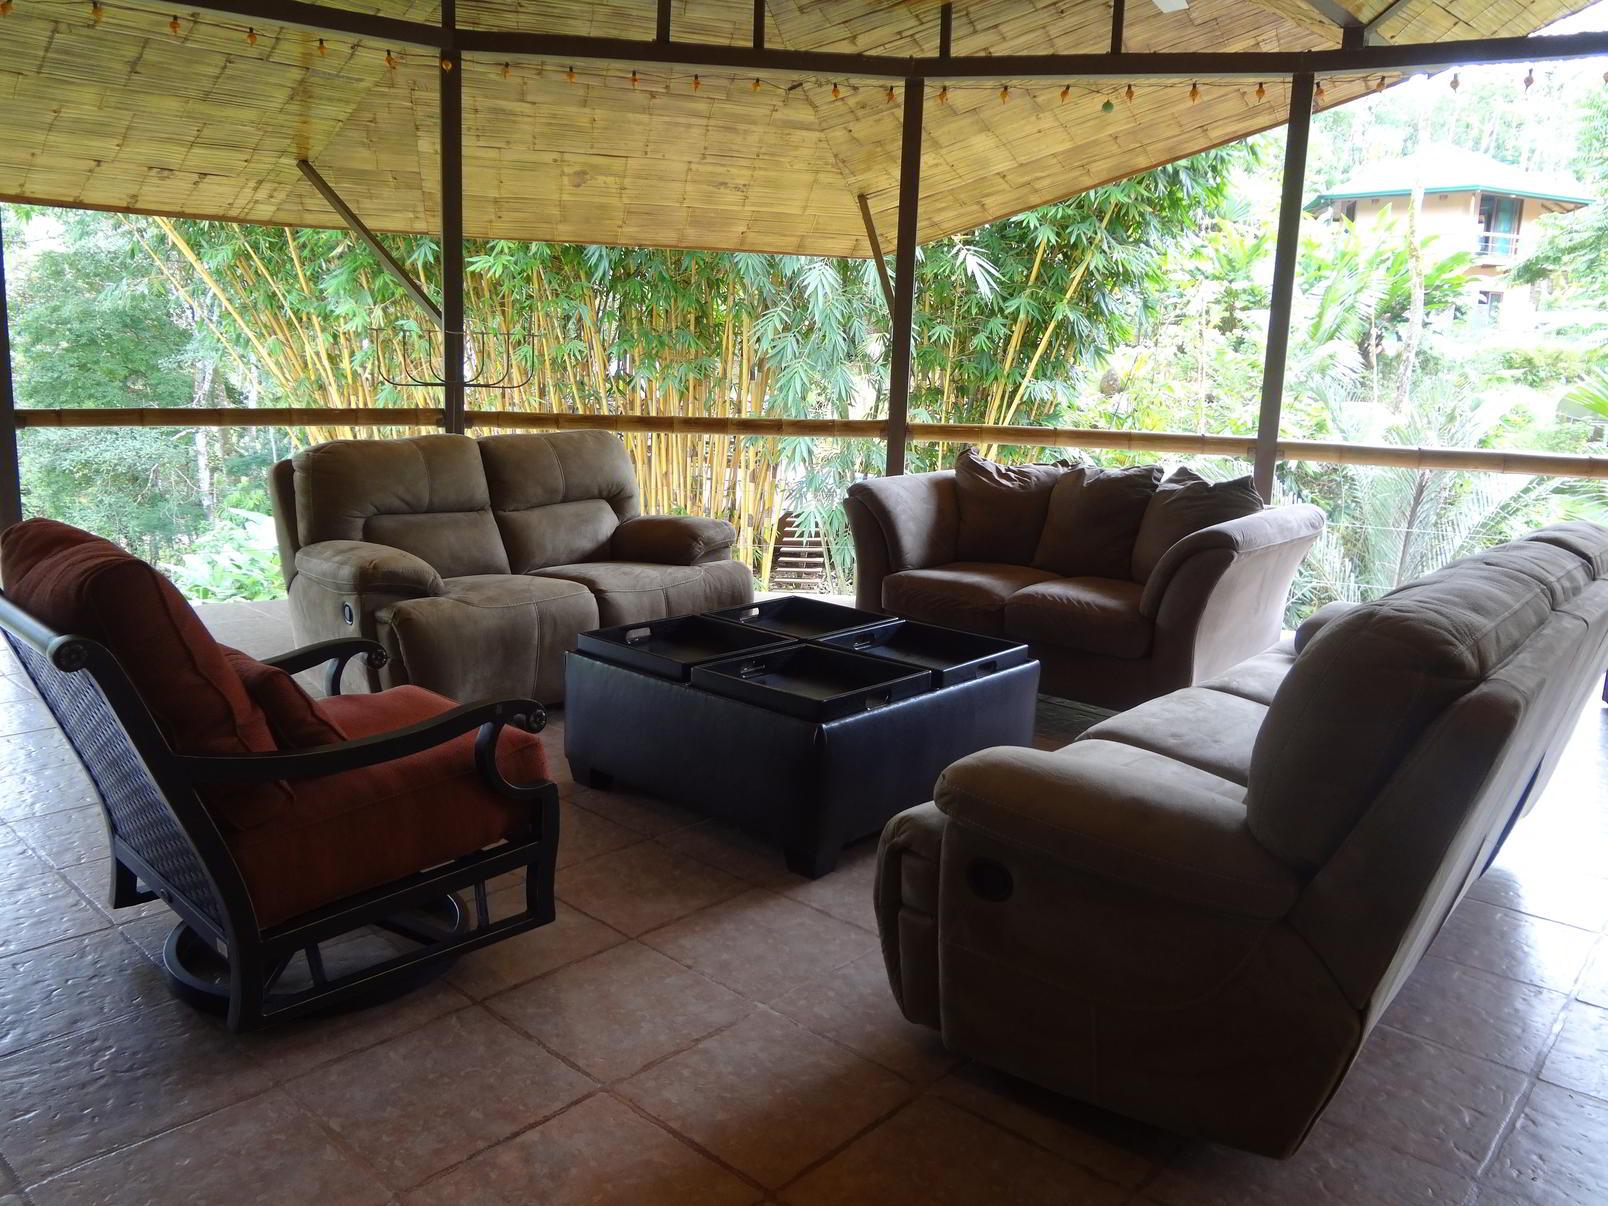 Balcony Lounge Day